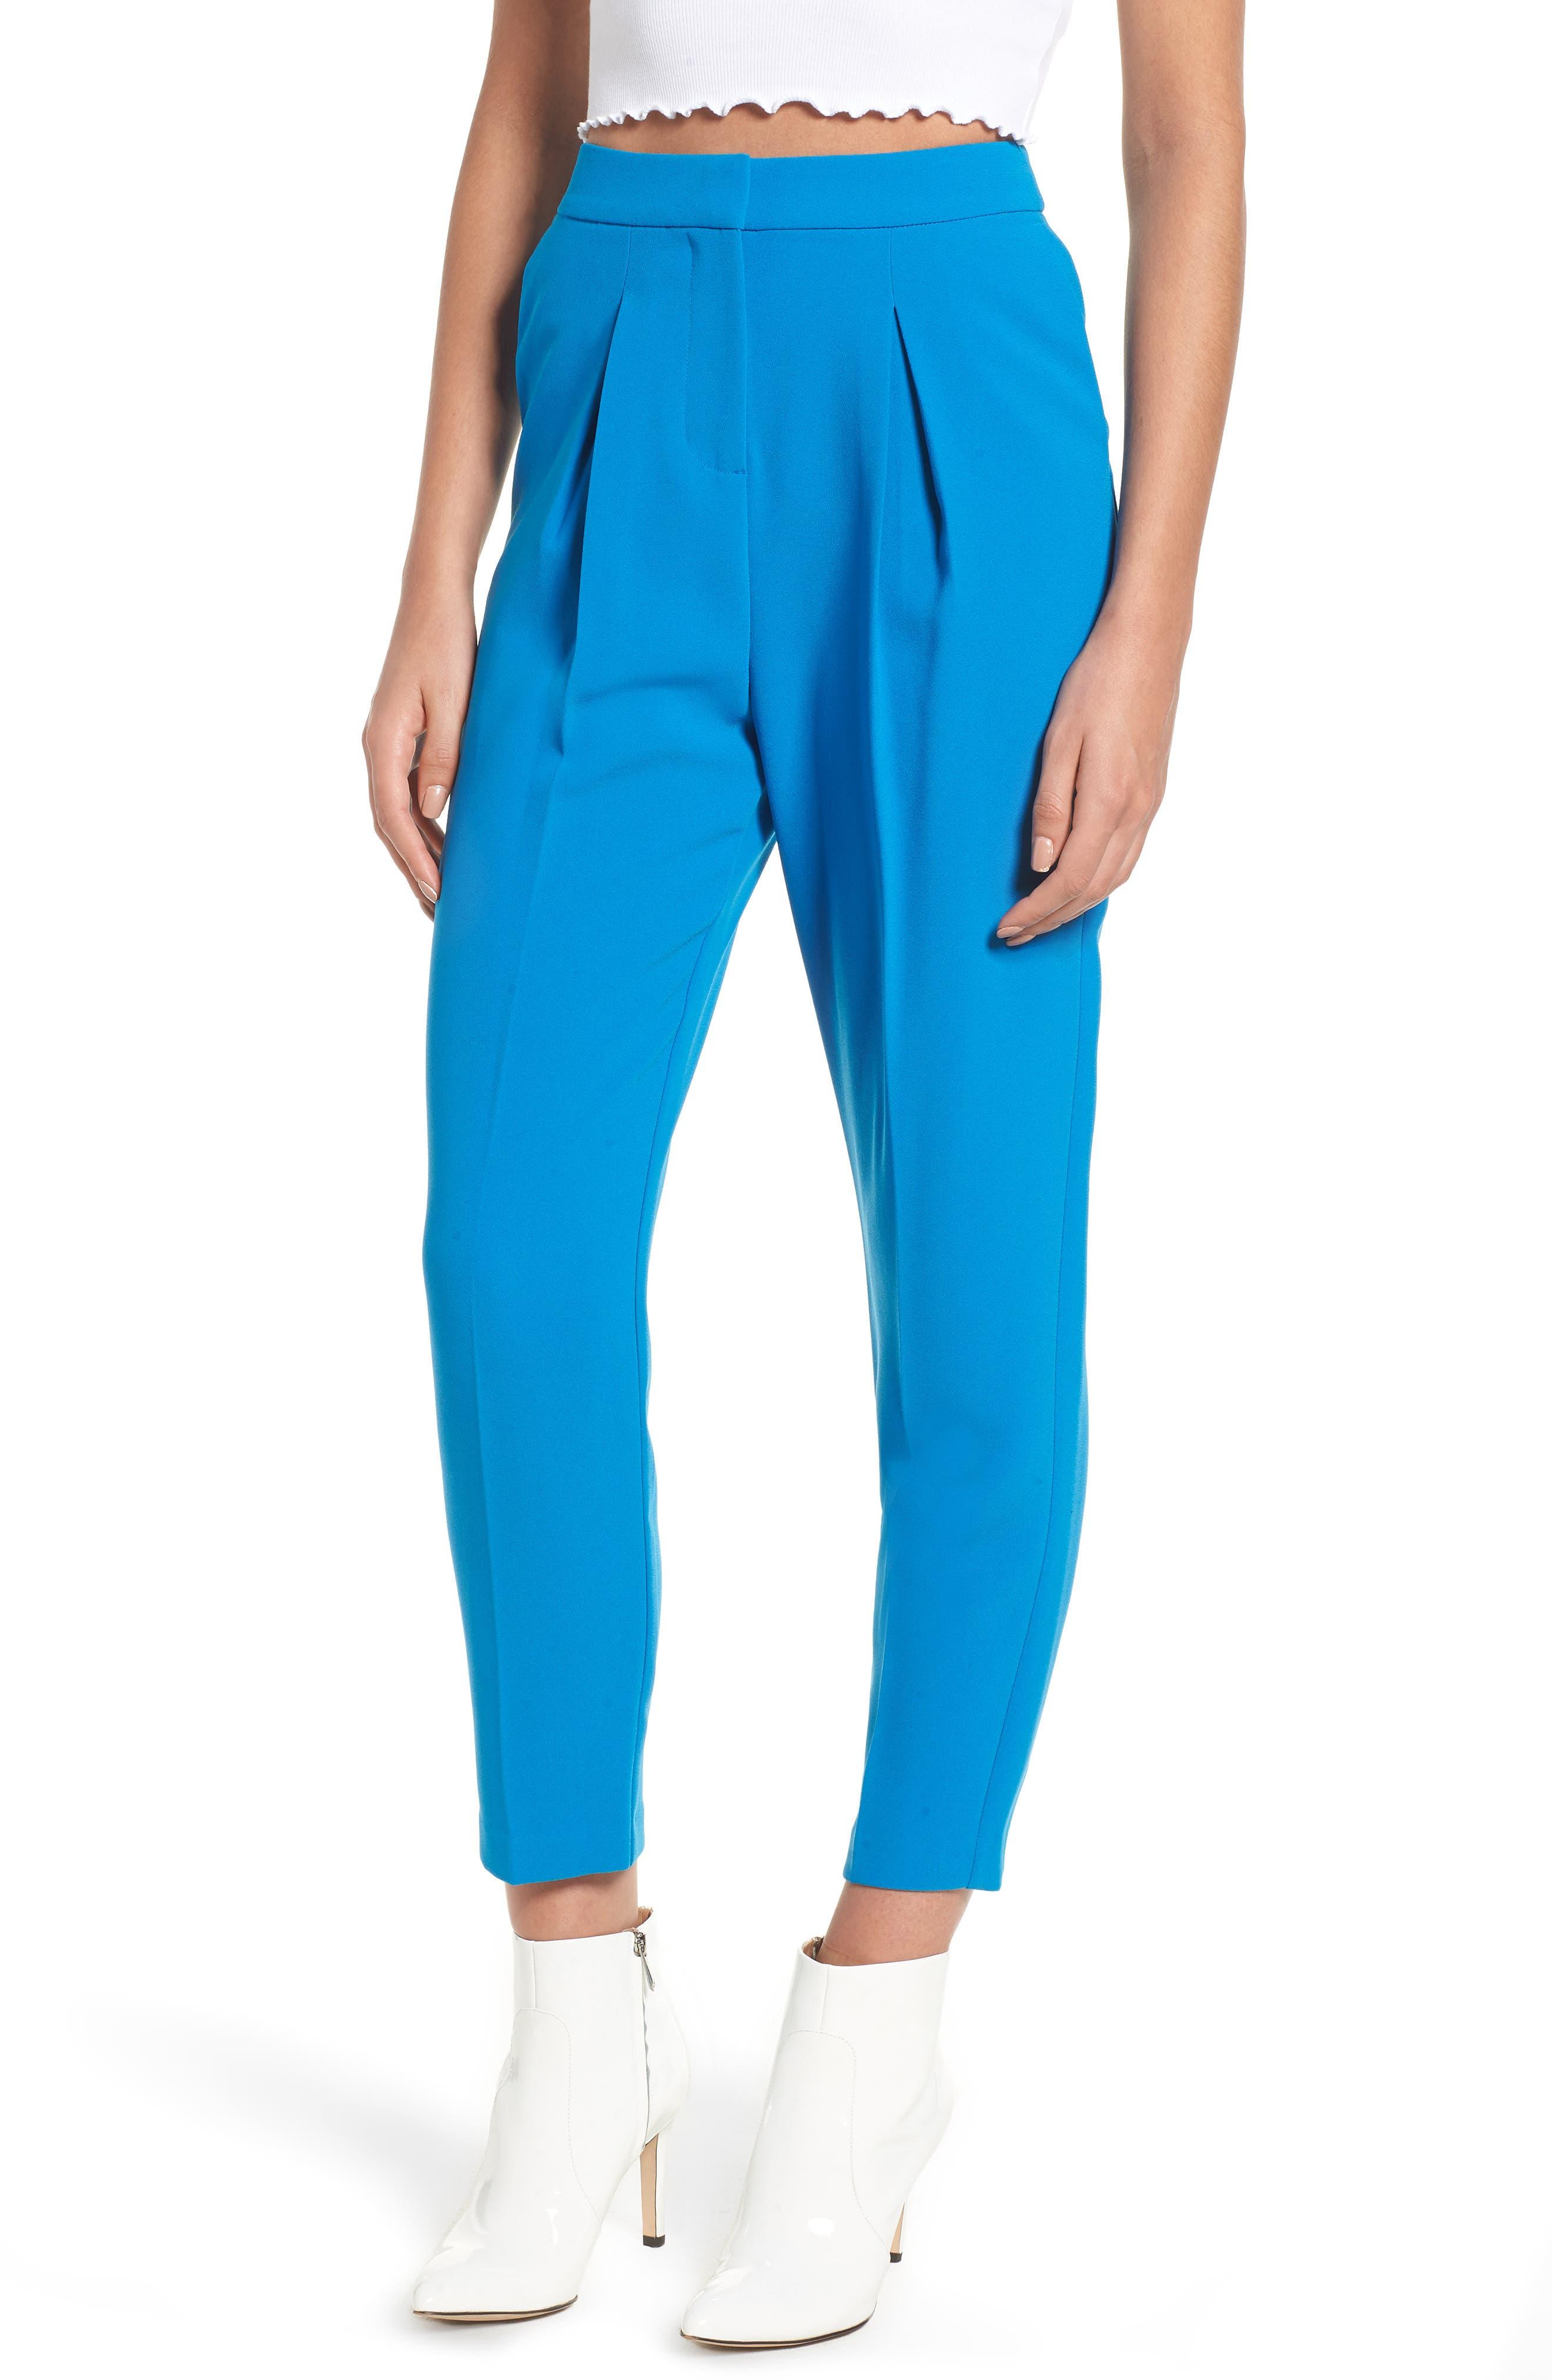 Clara Peg Belted Trousers,                             Main thumbnail 1, color,                             Cobalt